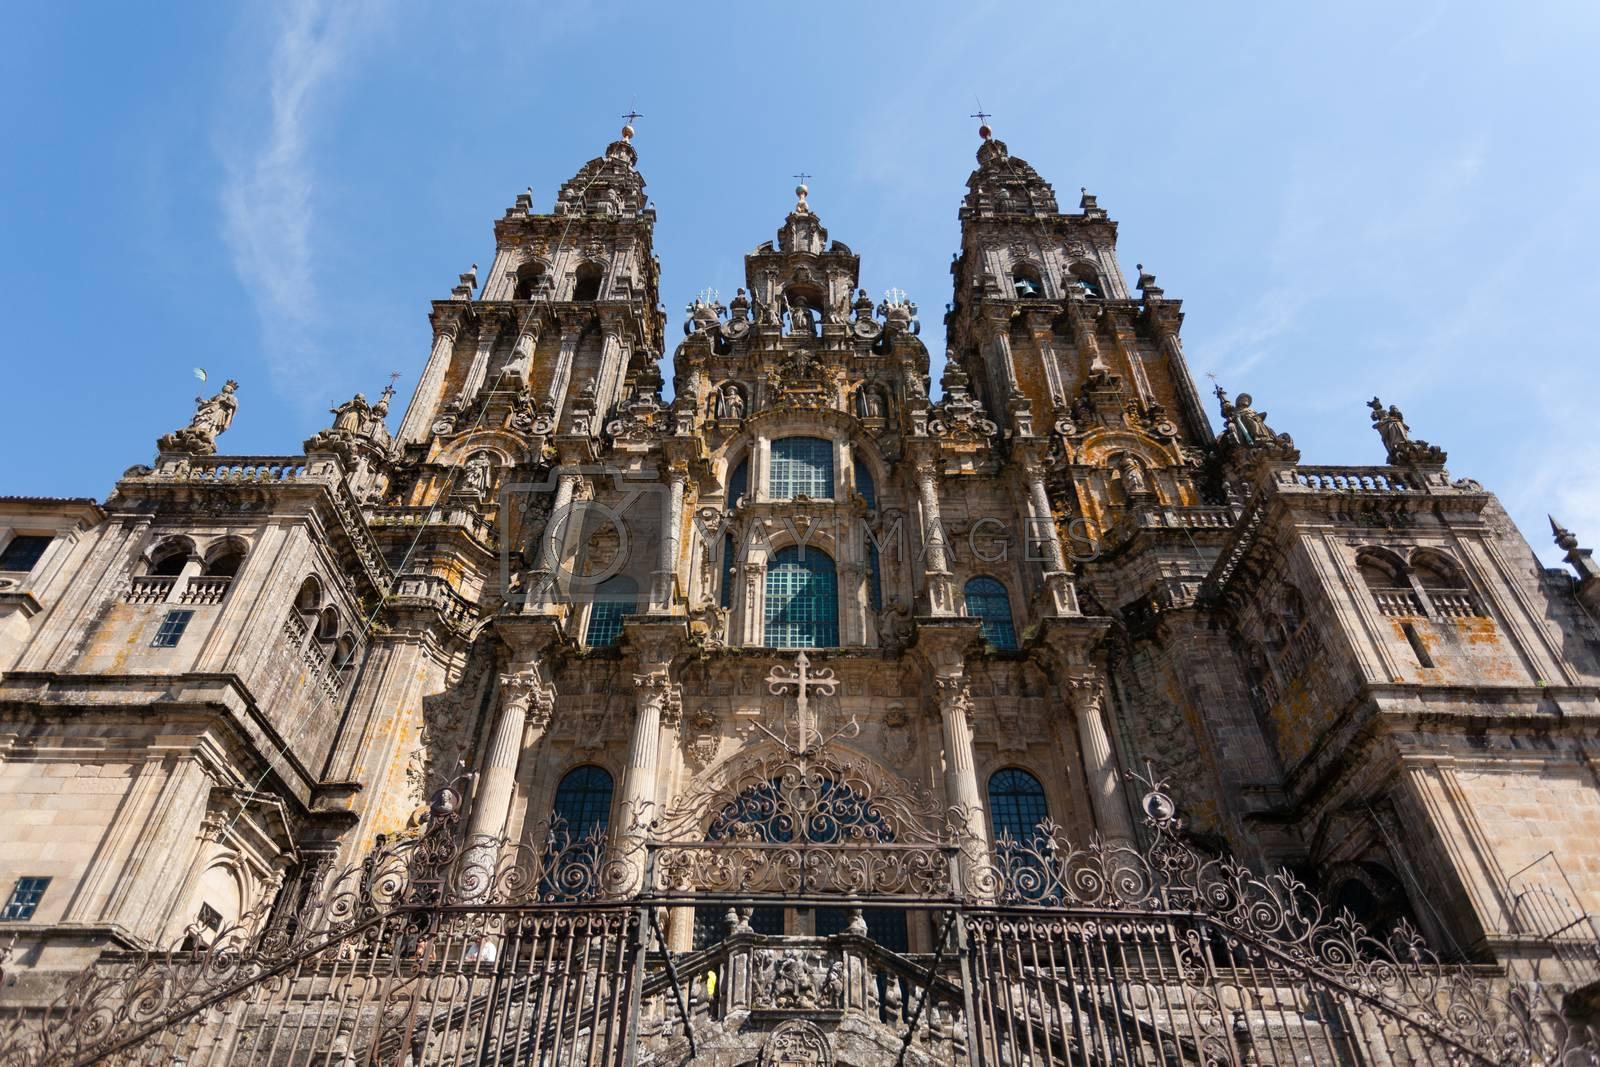 View of main entrance boroque facade of Santiago de Compostela cathedral in Spain